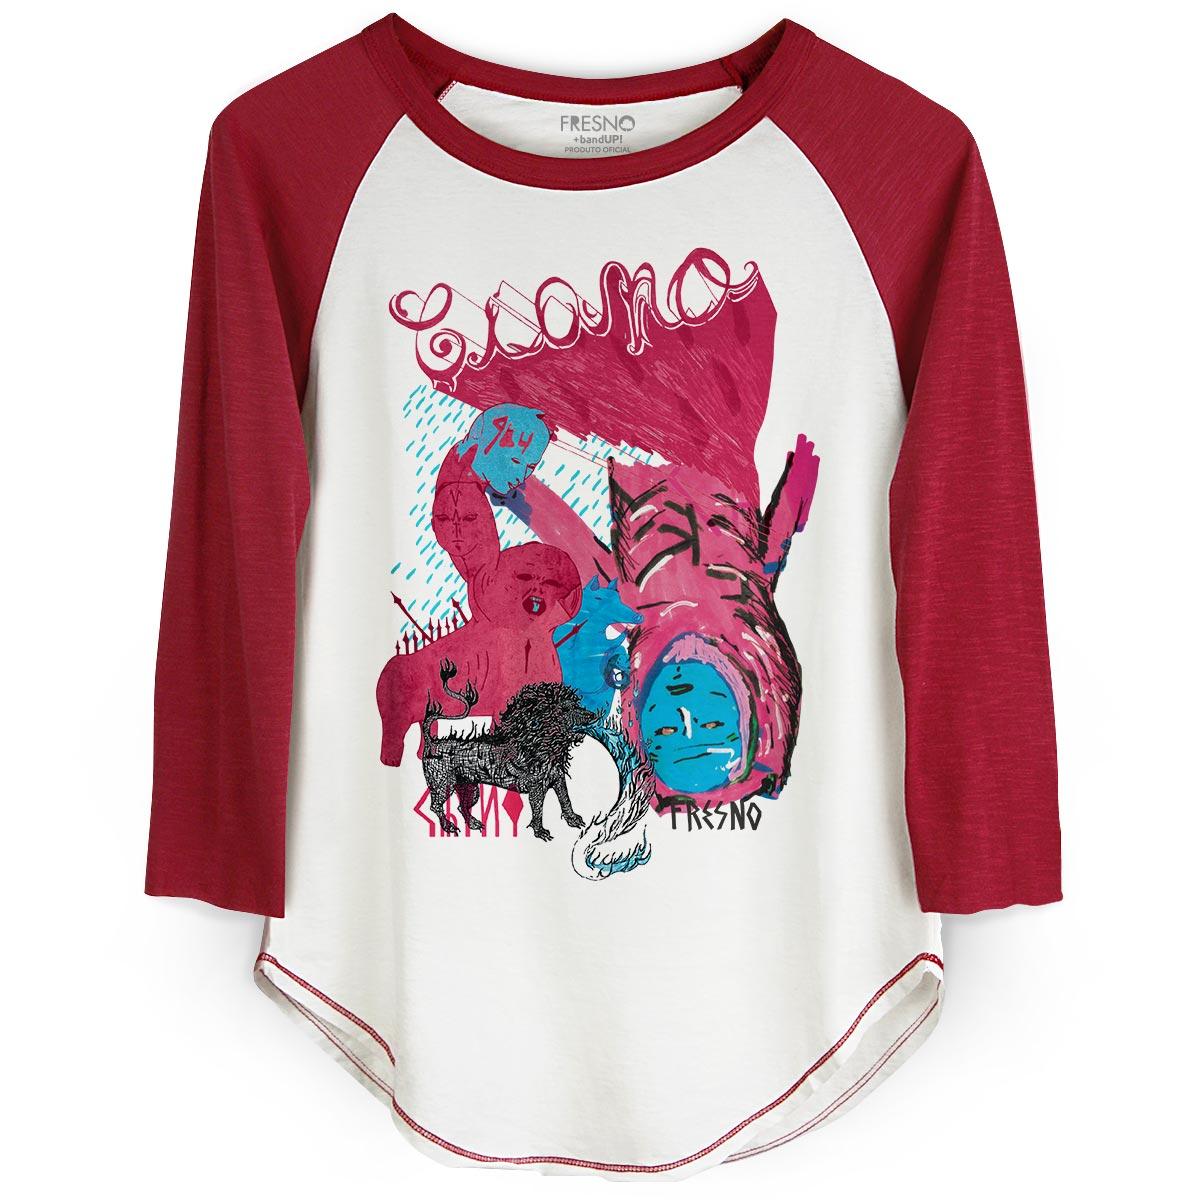 Camiseta Raglan Feminina Fresno Ciano Enxergar  - bandUP Store Marketplace